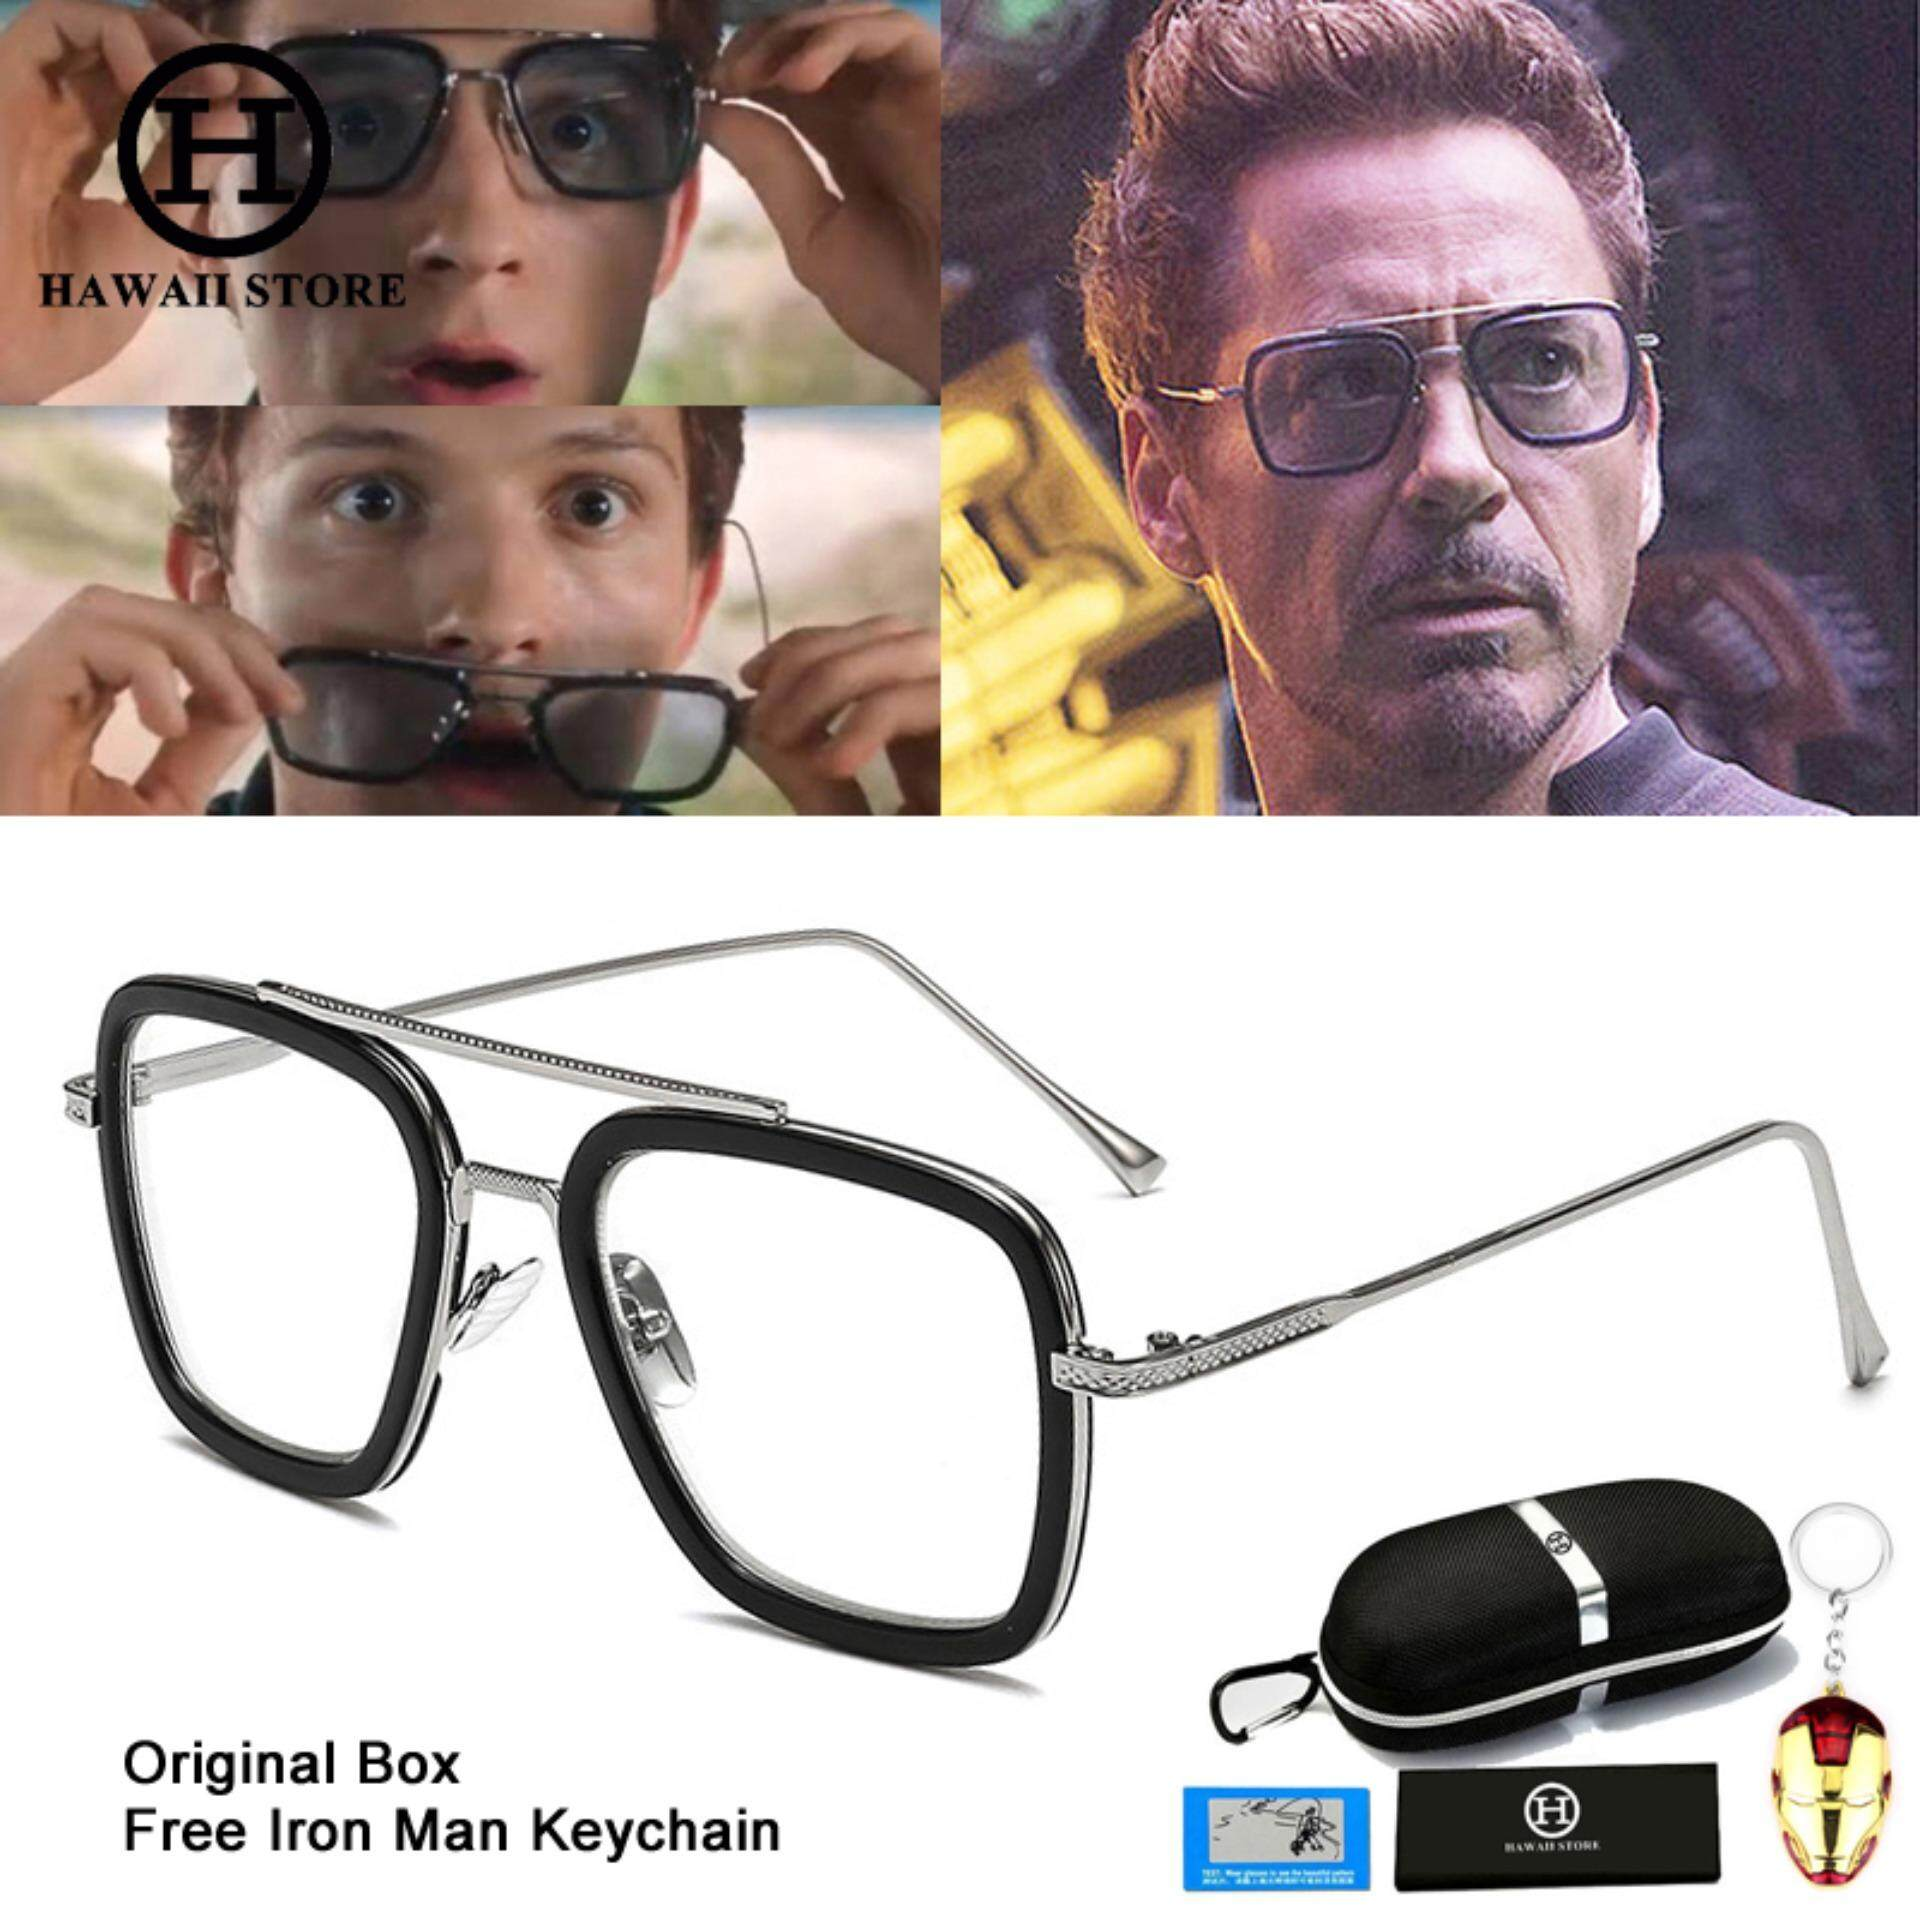 Hawaii Koleksi Fashion Avengers Tony Stark Penerbangan 006 Style Men Square Penerbangan Merek Desain Kacamata Hitam